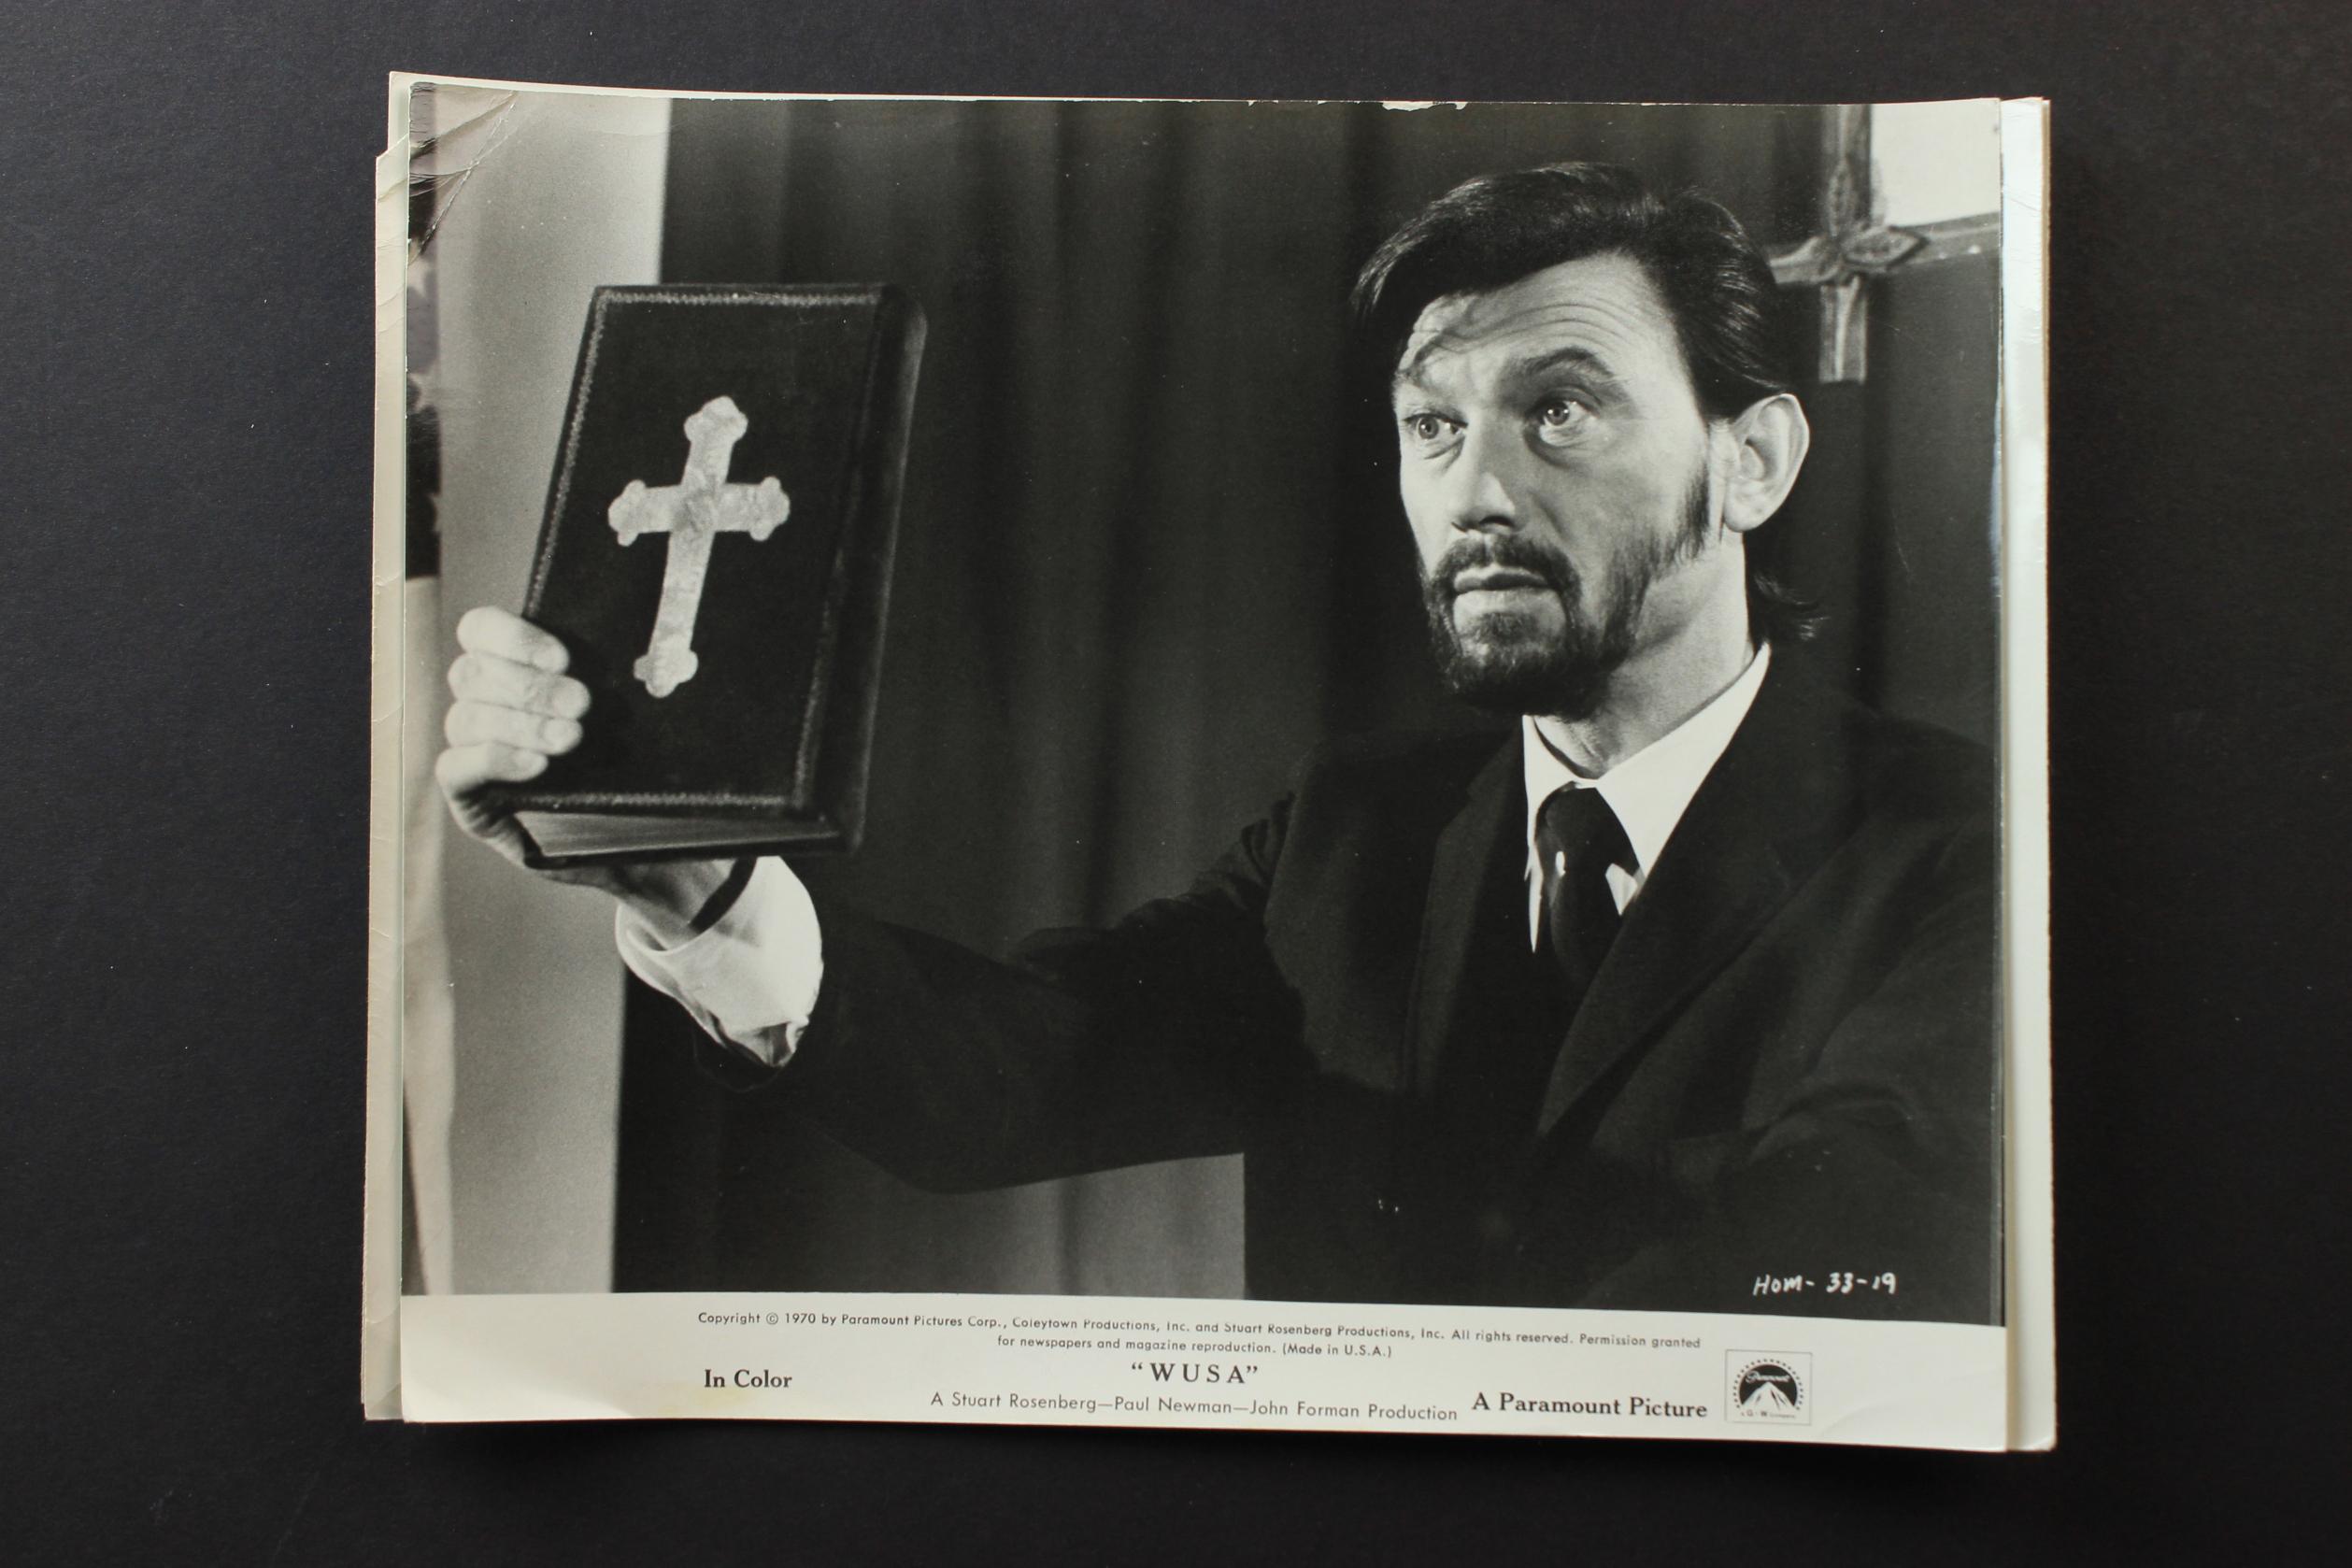 WUSA (1970)